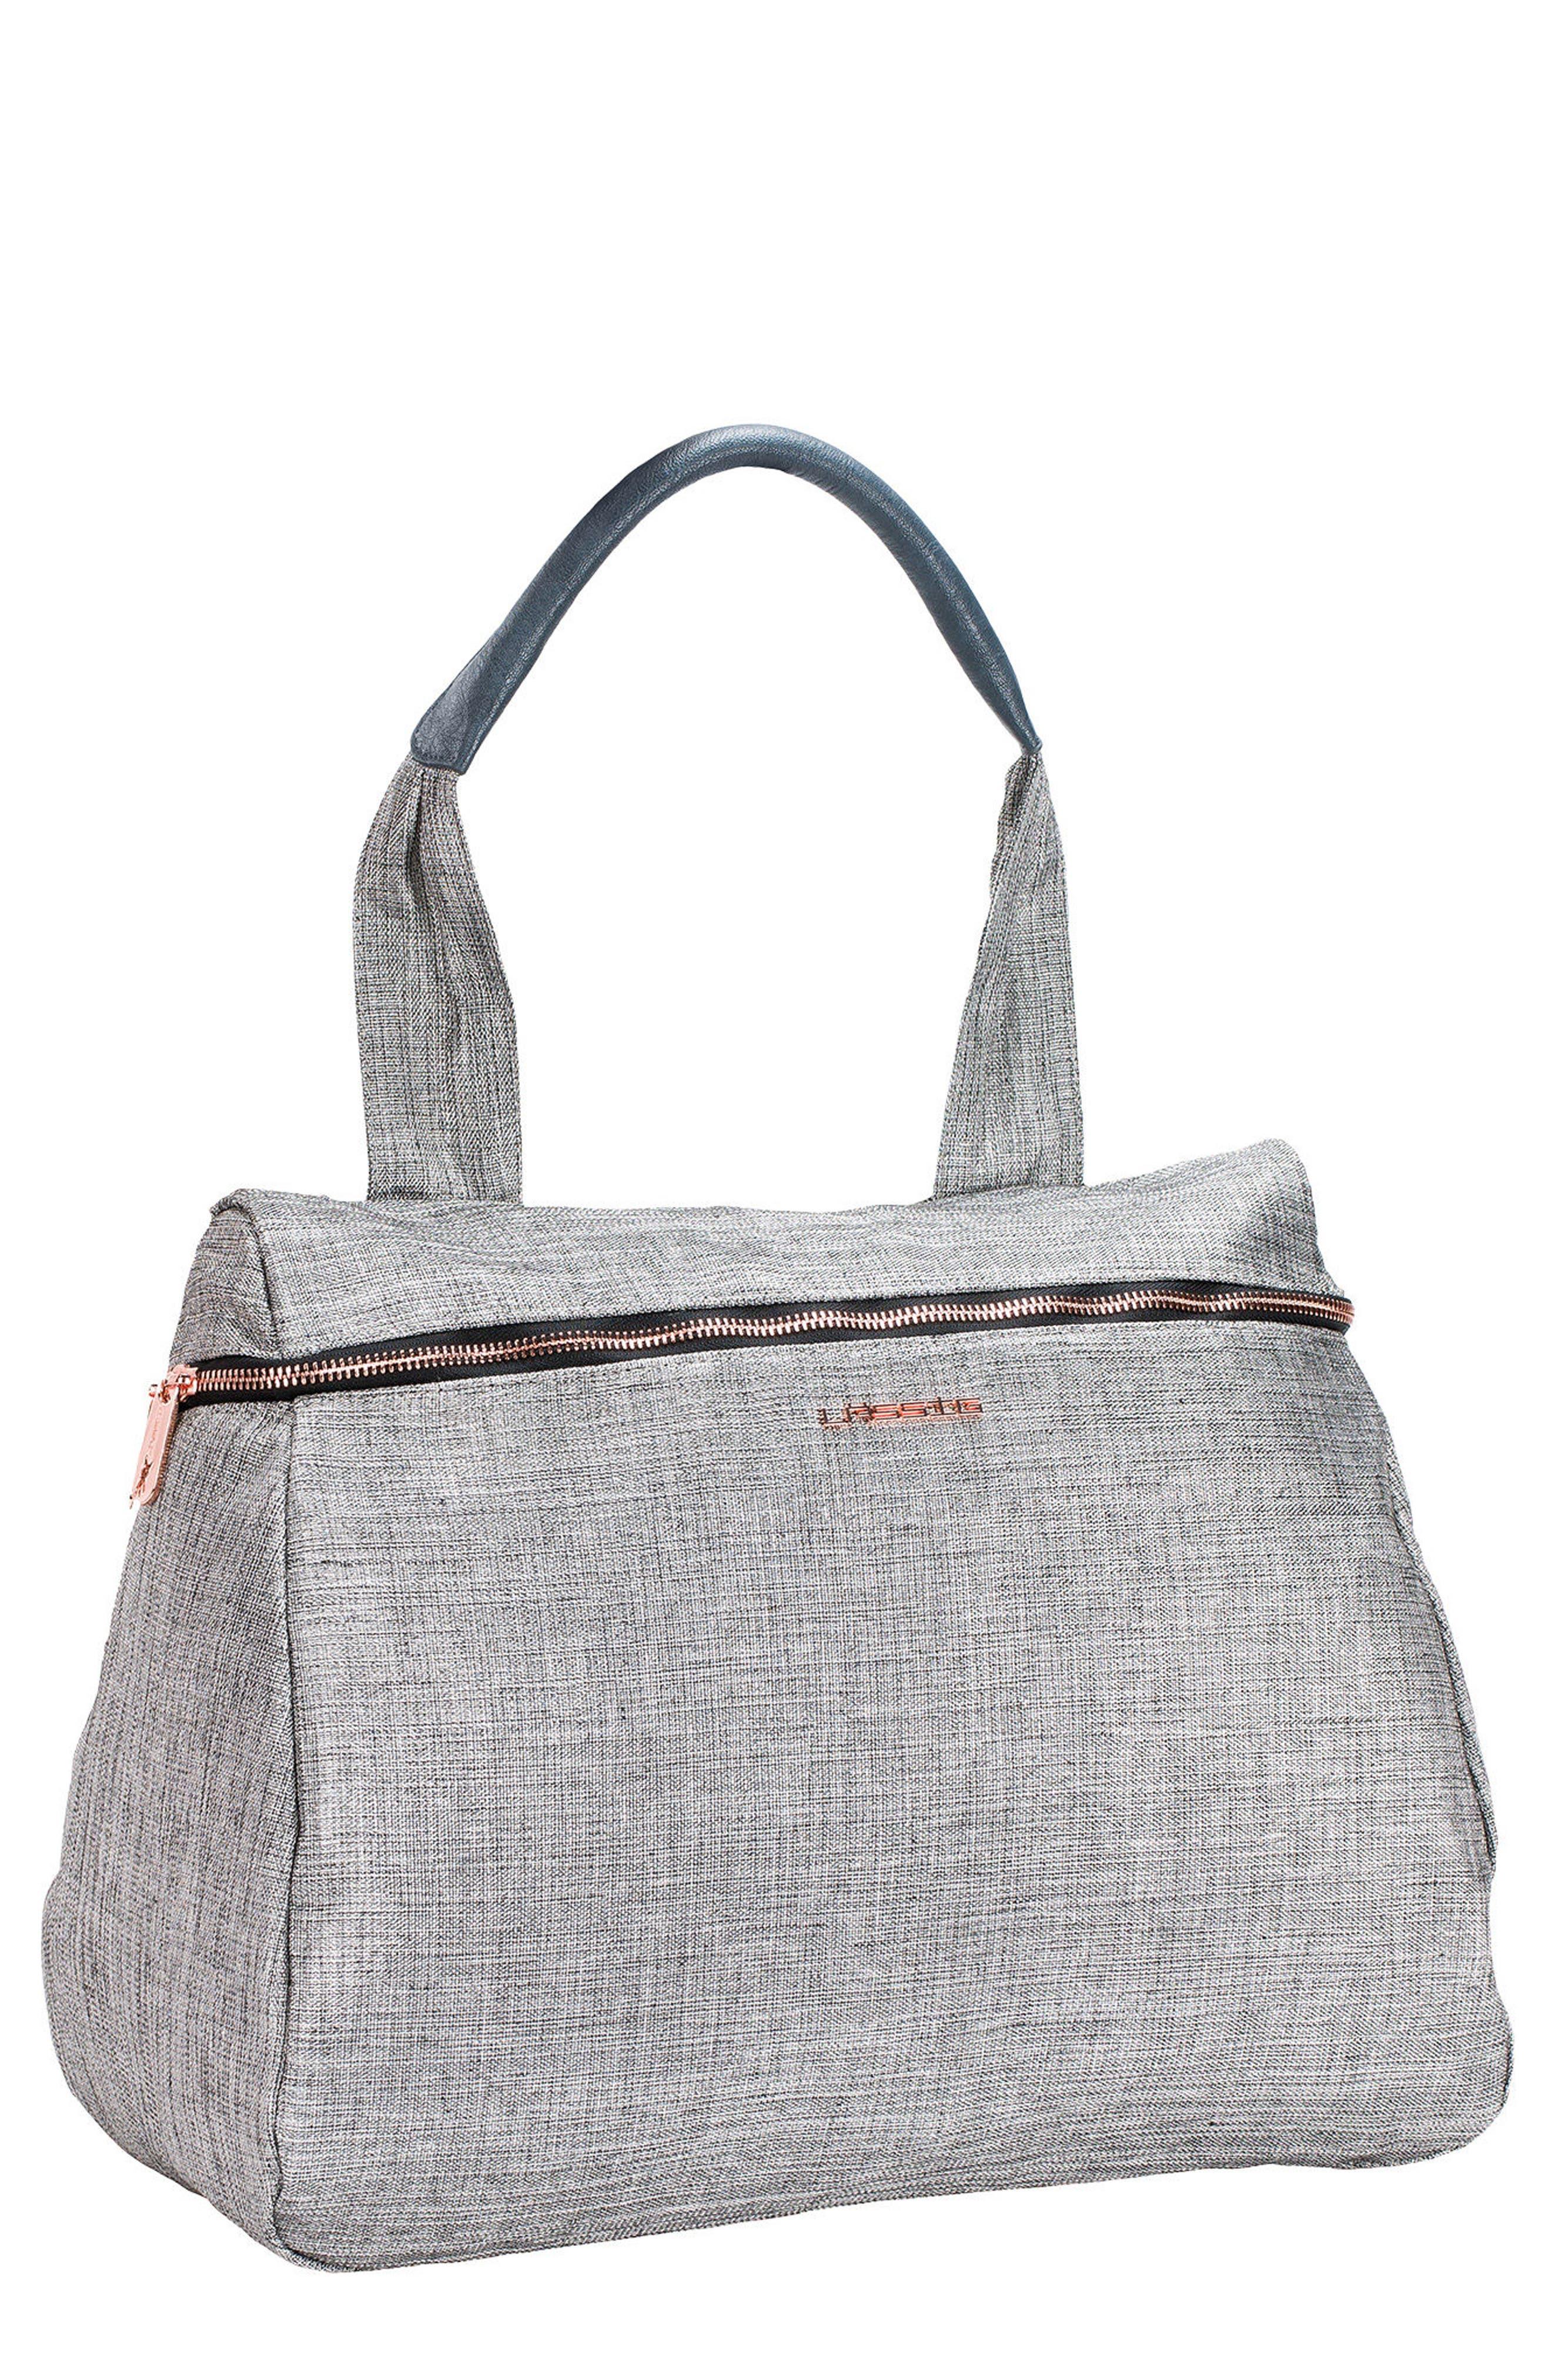 Glam Rosie Diaper Bag,                             Main thumbnail 1, color,                             Anthracite Glitter